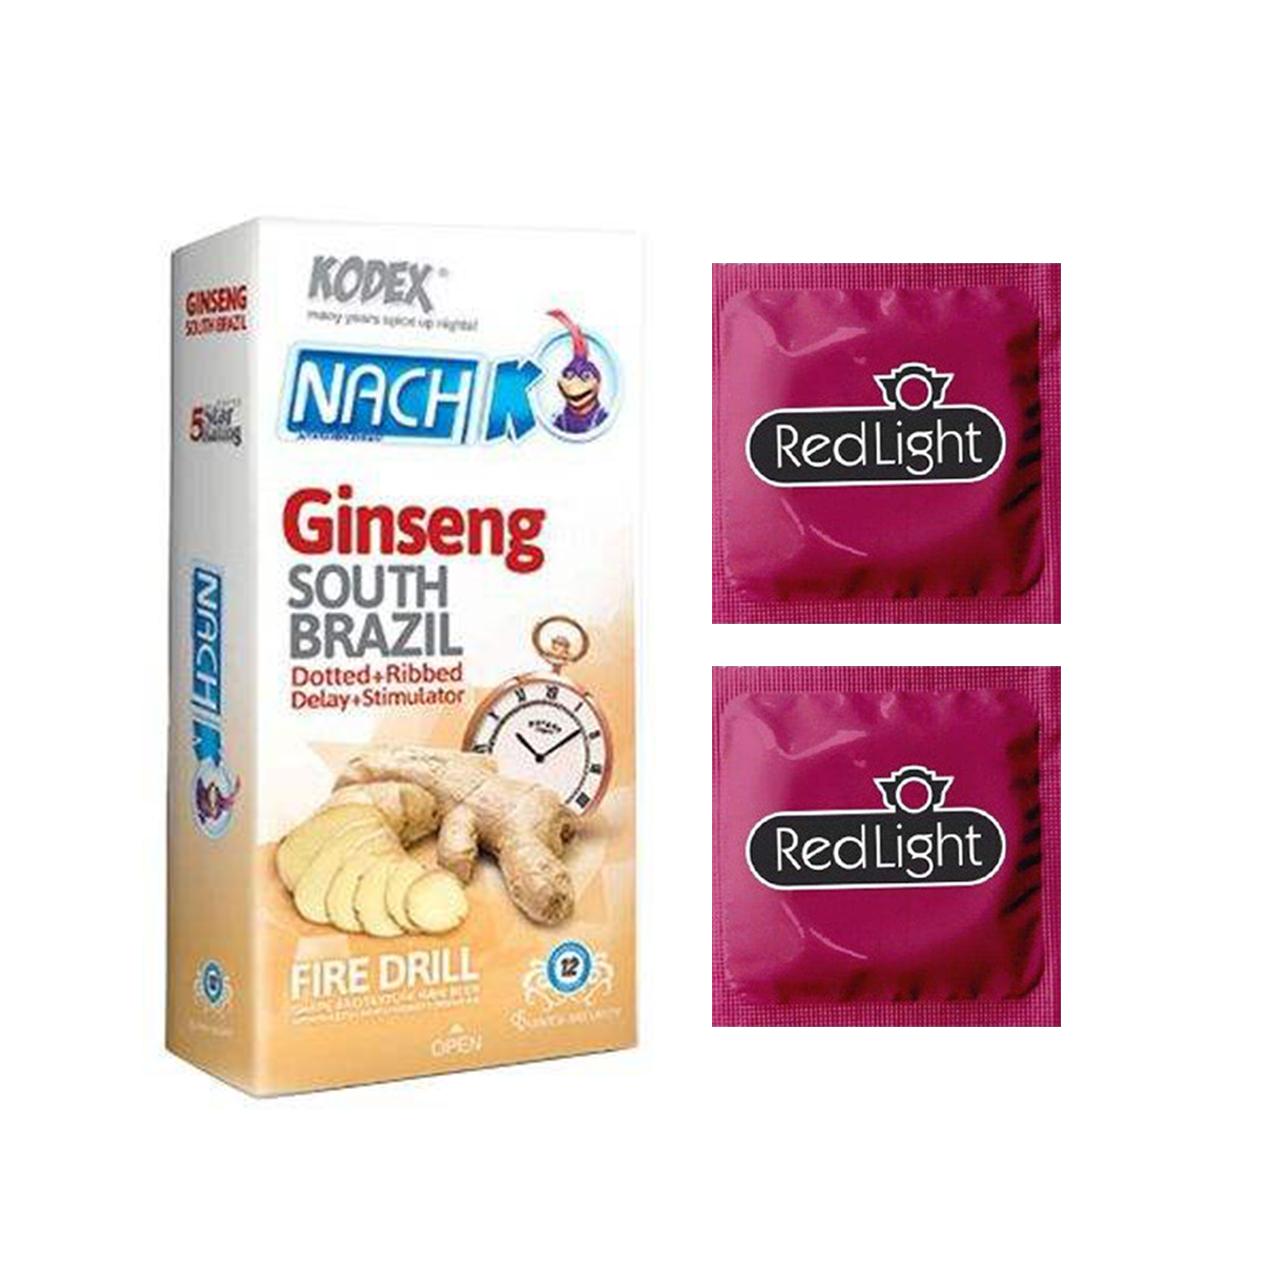 خرید                      کاندوم ناچ کدکس مدل Ginseng بسته 12 عددی به همراه کاندوم ردلایت مدل فویل مجموعه 2 عددی